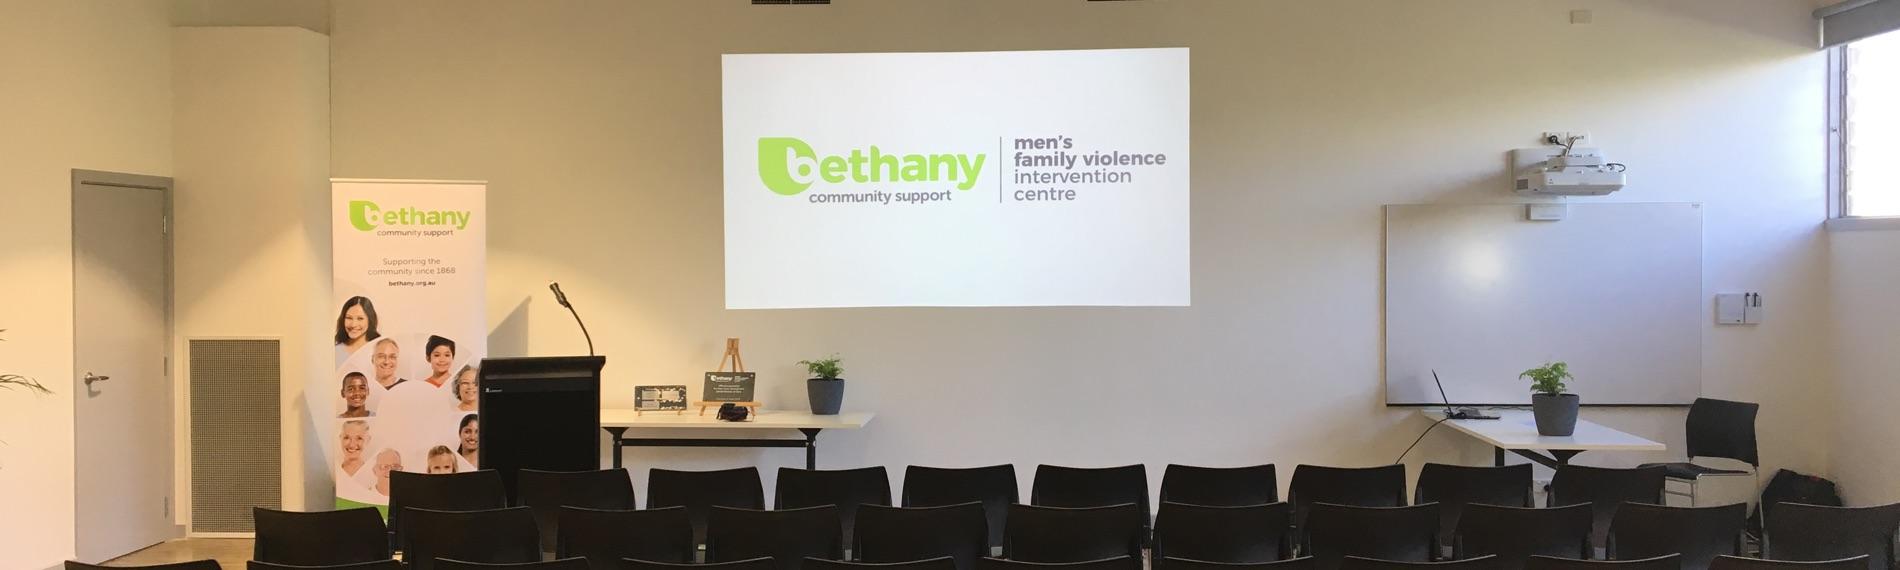 Bethany photo - Banner.jpg